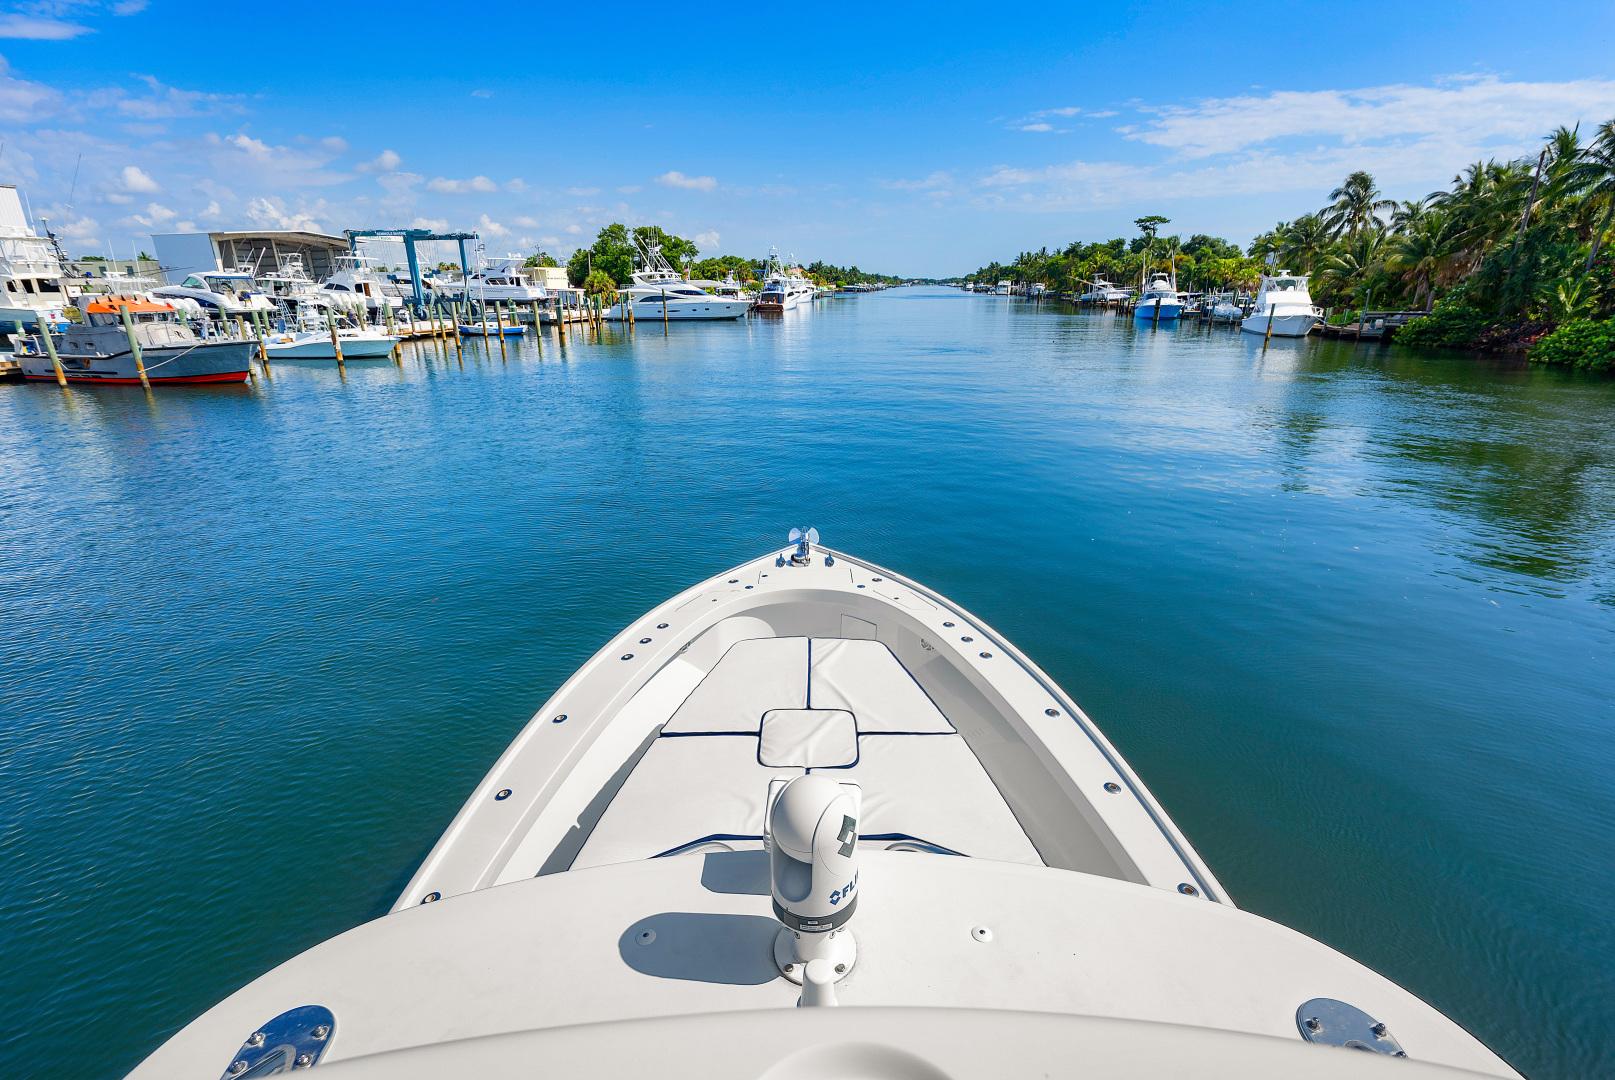 Release-Walkaround 2014-De Bowat Palm Beach Gardens-United States-1364501 | Thumbnail